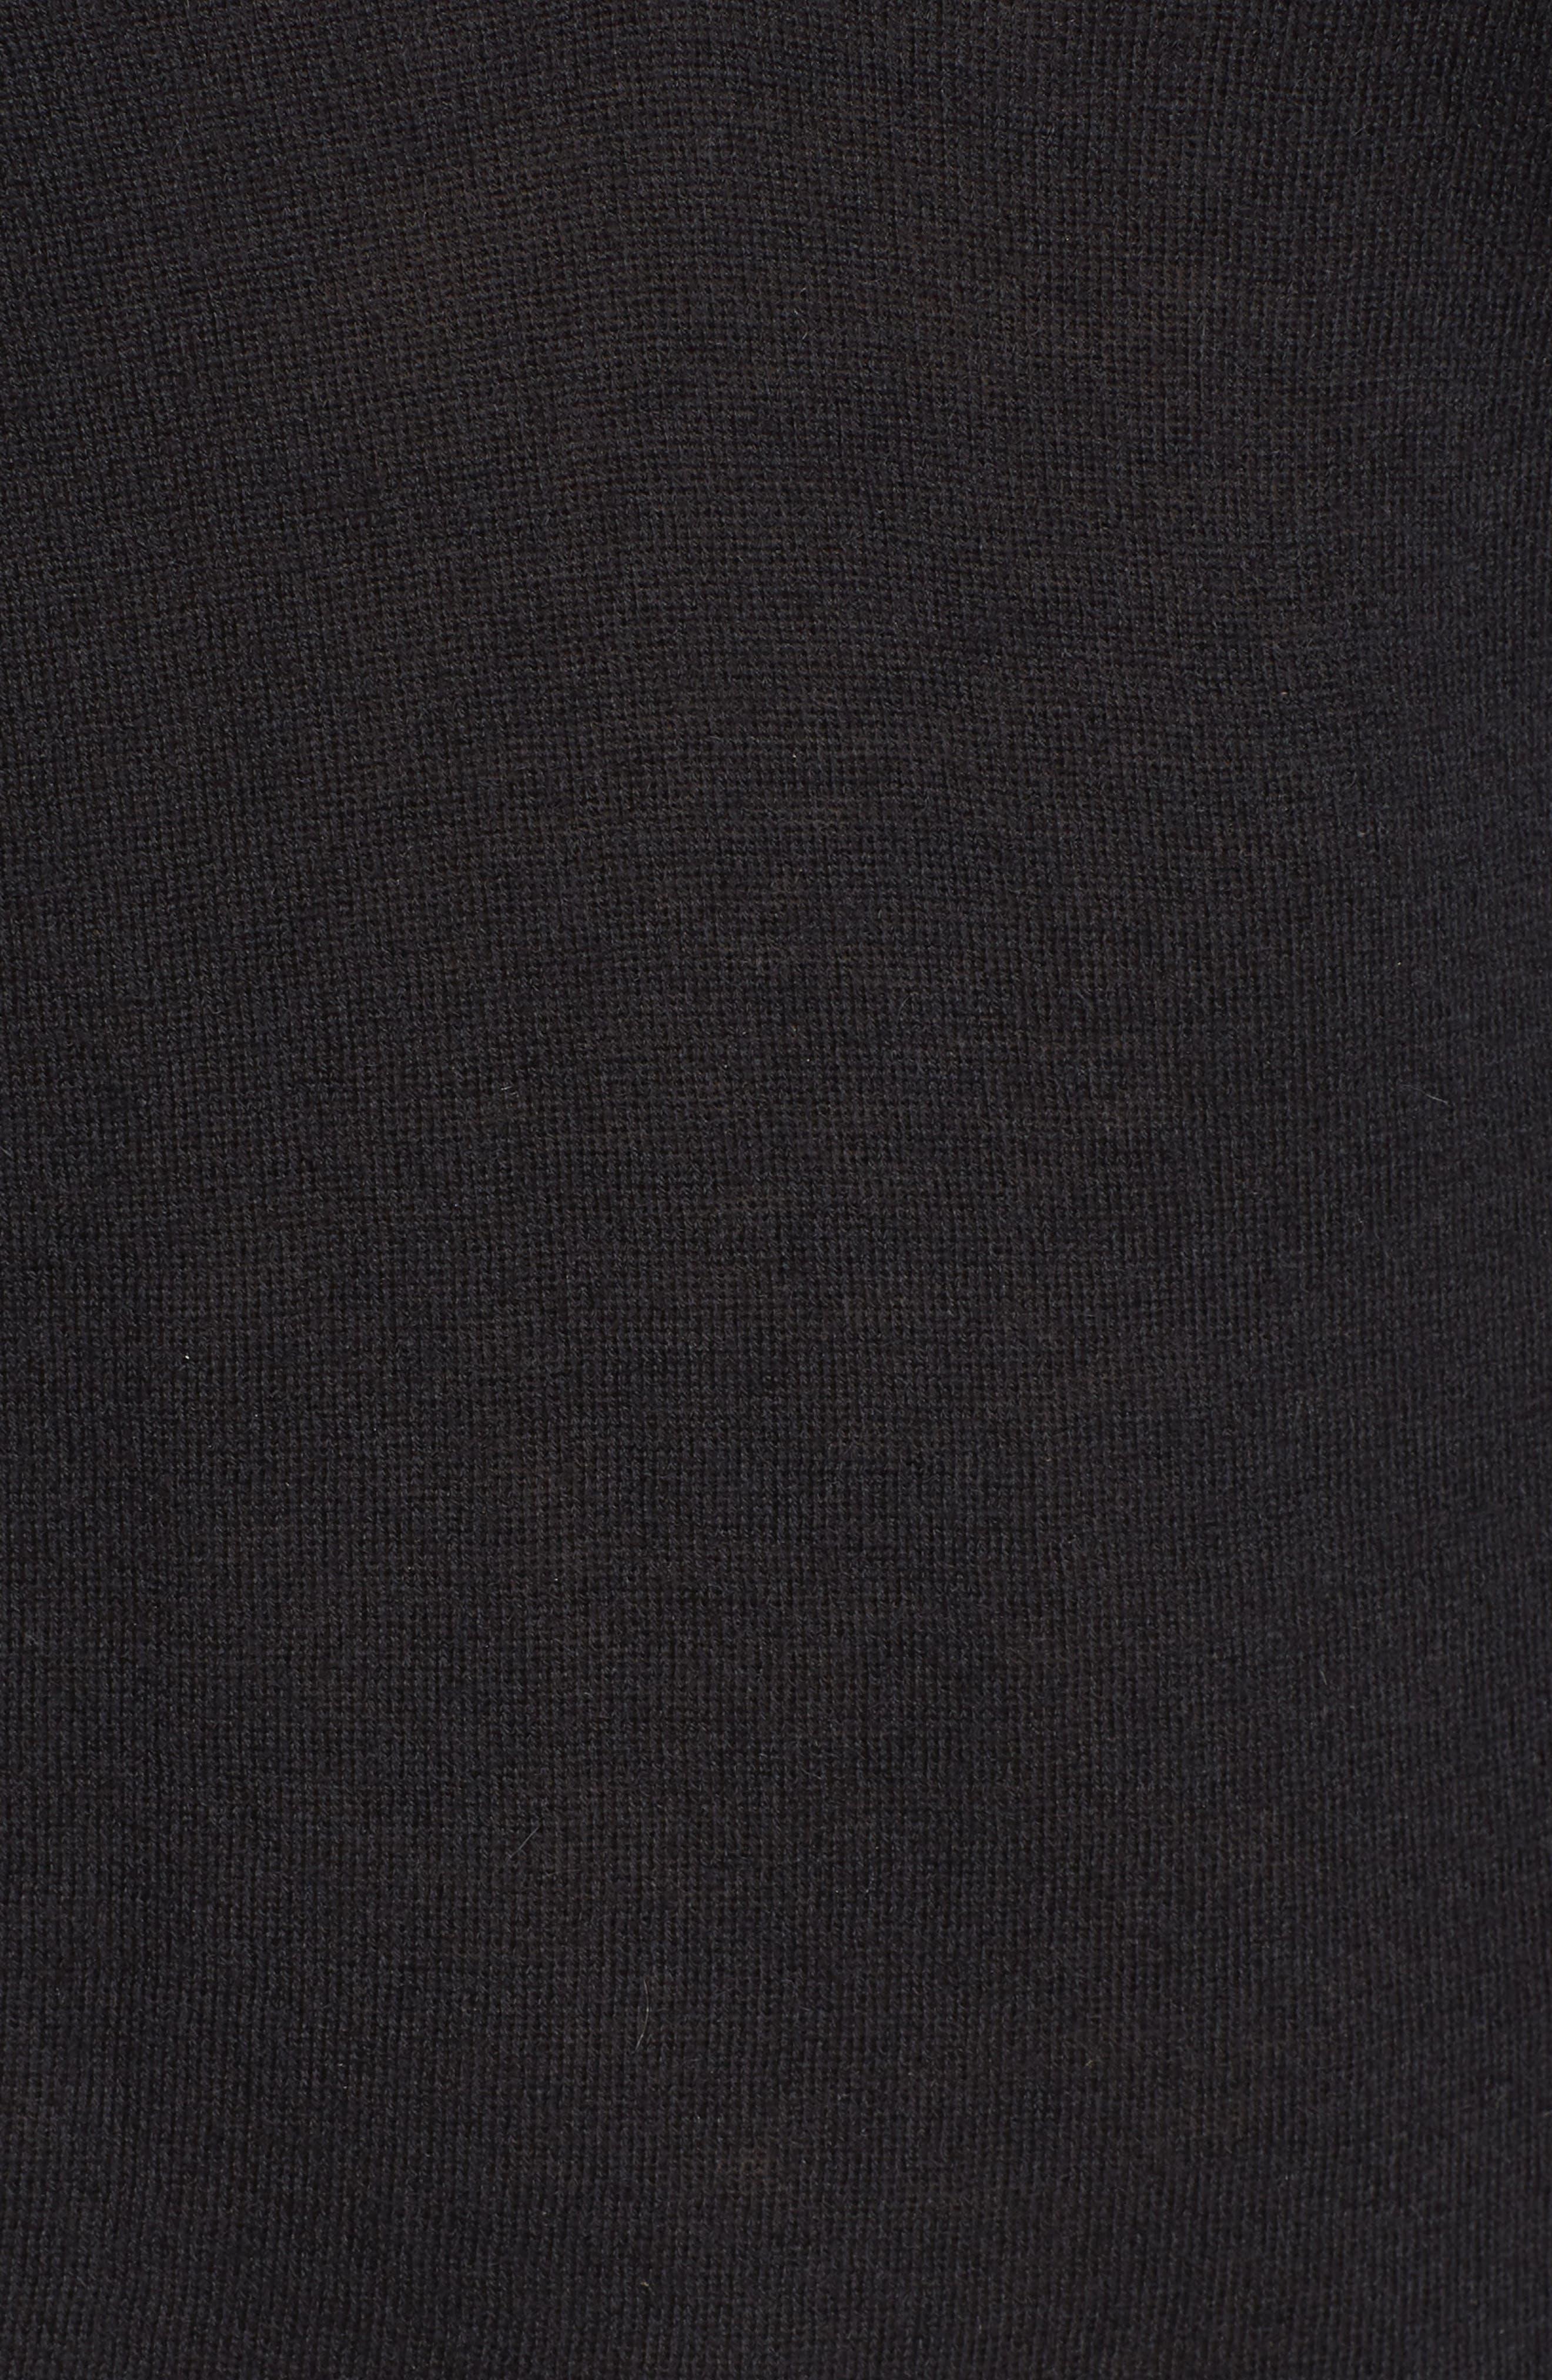 Uma V-Neck Cashmere Sweater,                             Alternate thumbnail 5, color,                             001